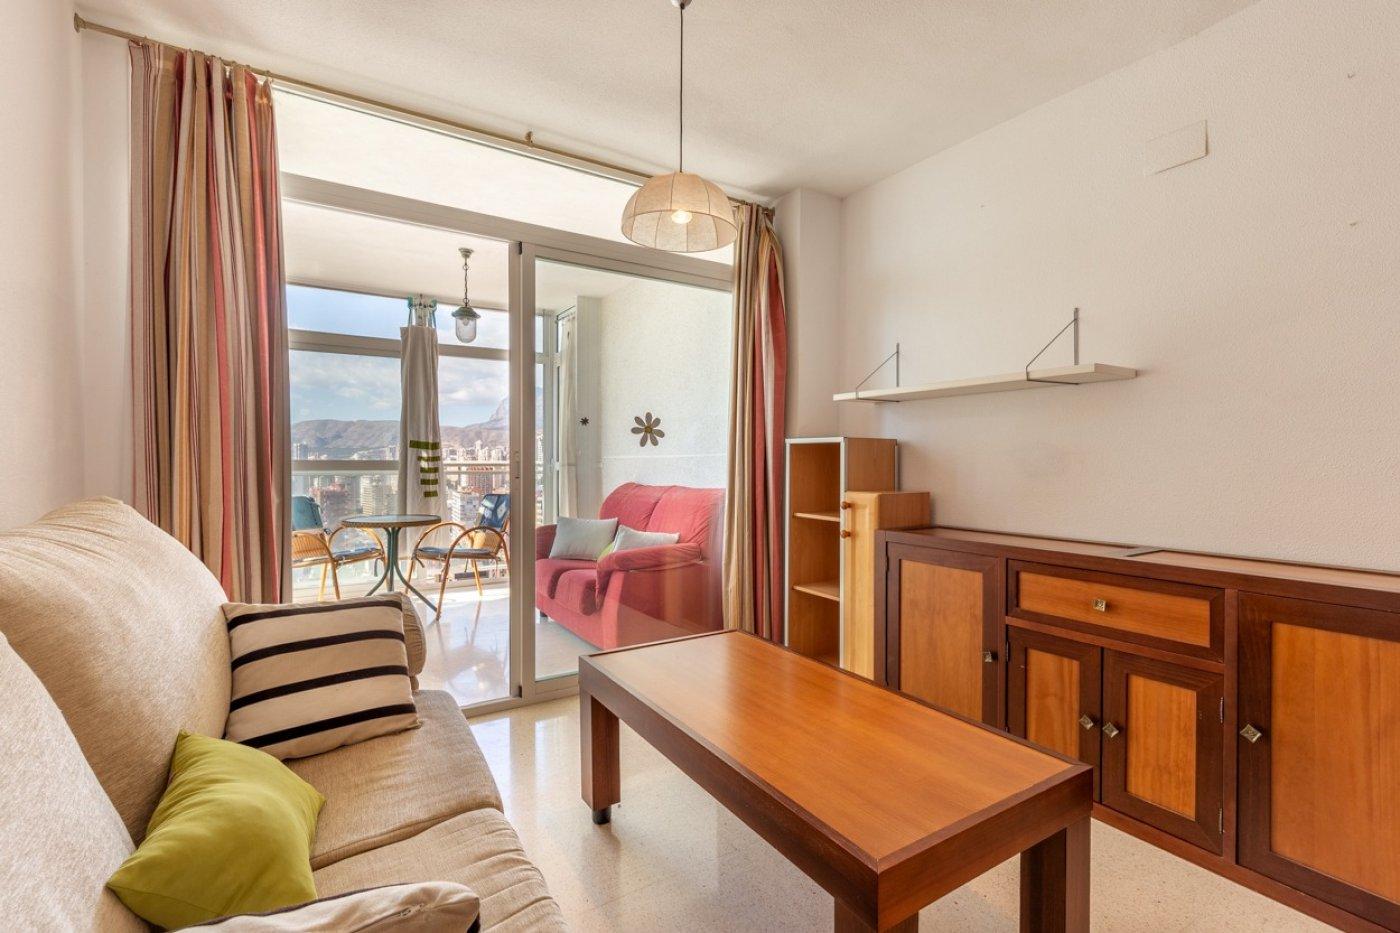 Apartamento en Benidorm zona Rincon de Loix de 57 m²